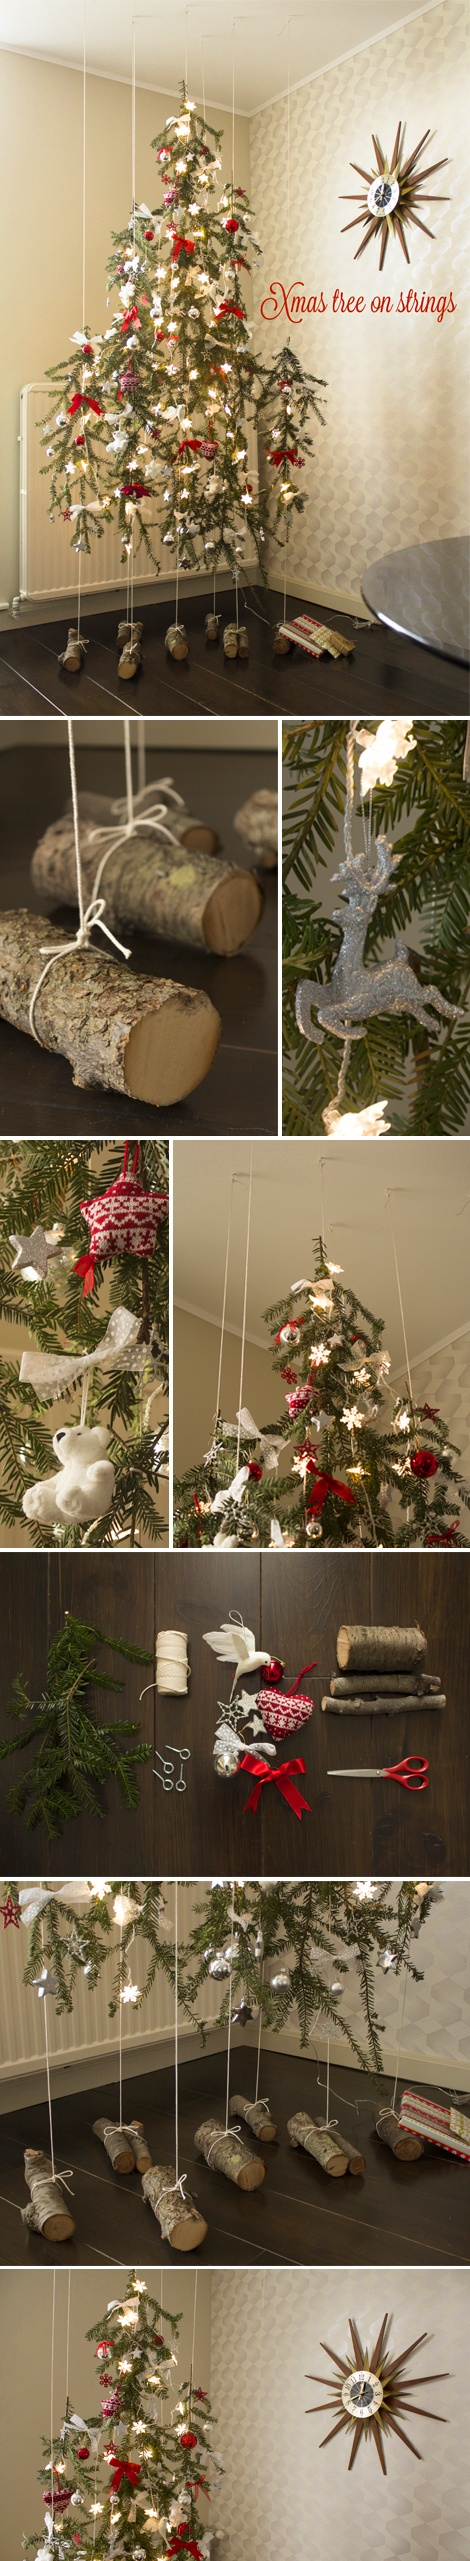 DIY Xmas tree on strings Coool, where can i hang this!?